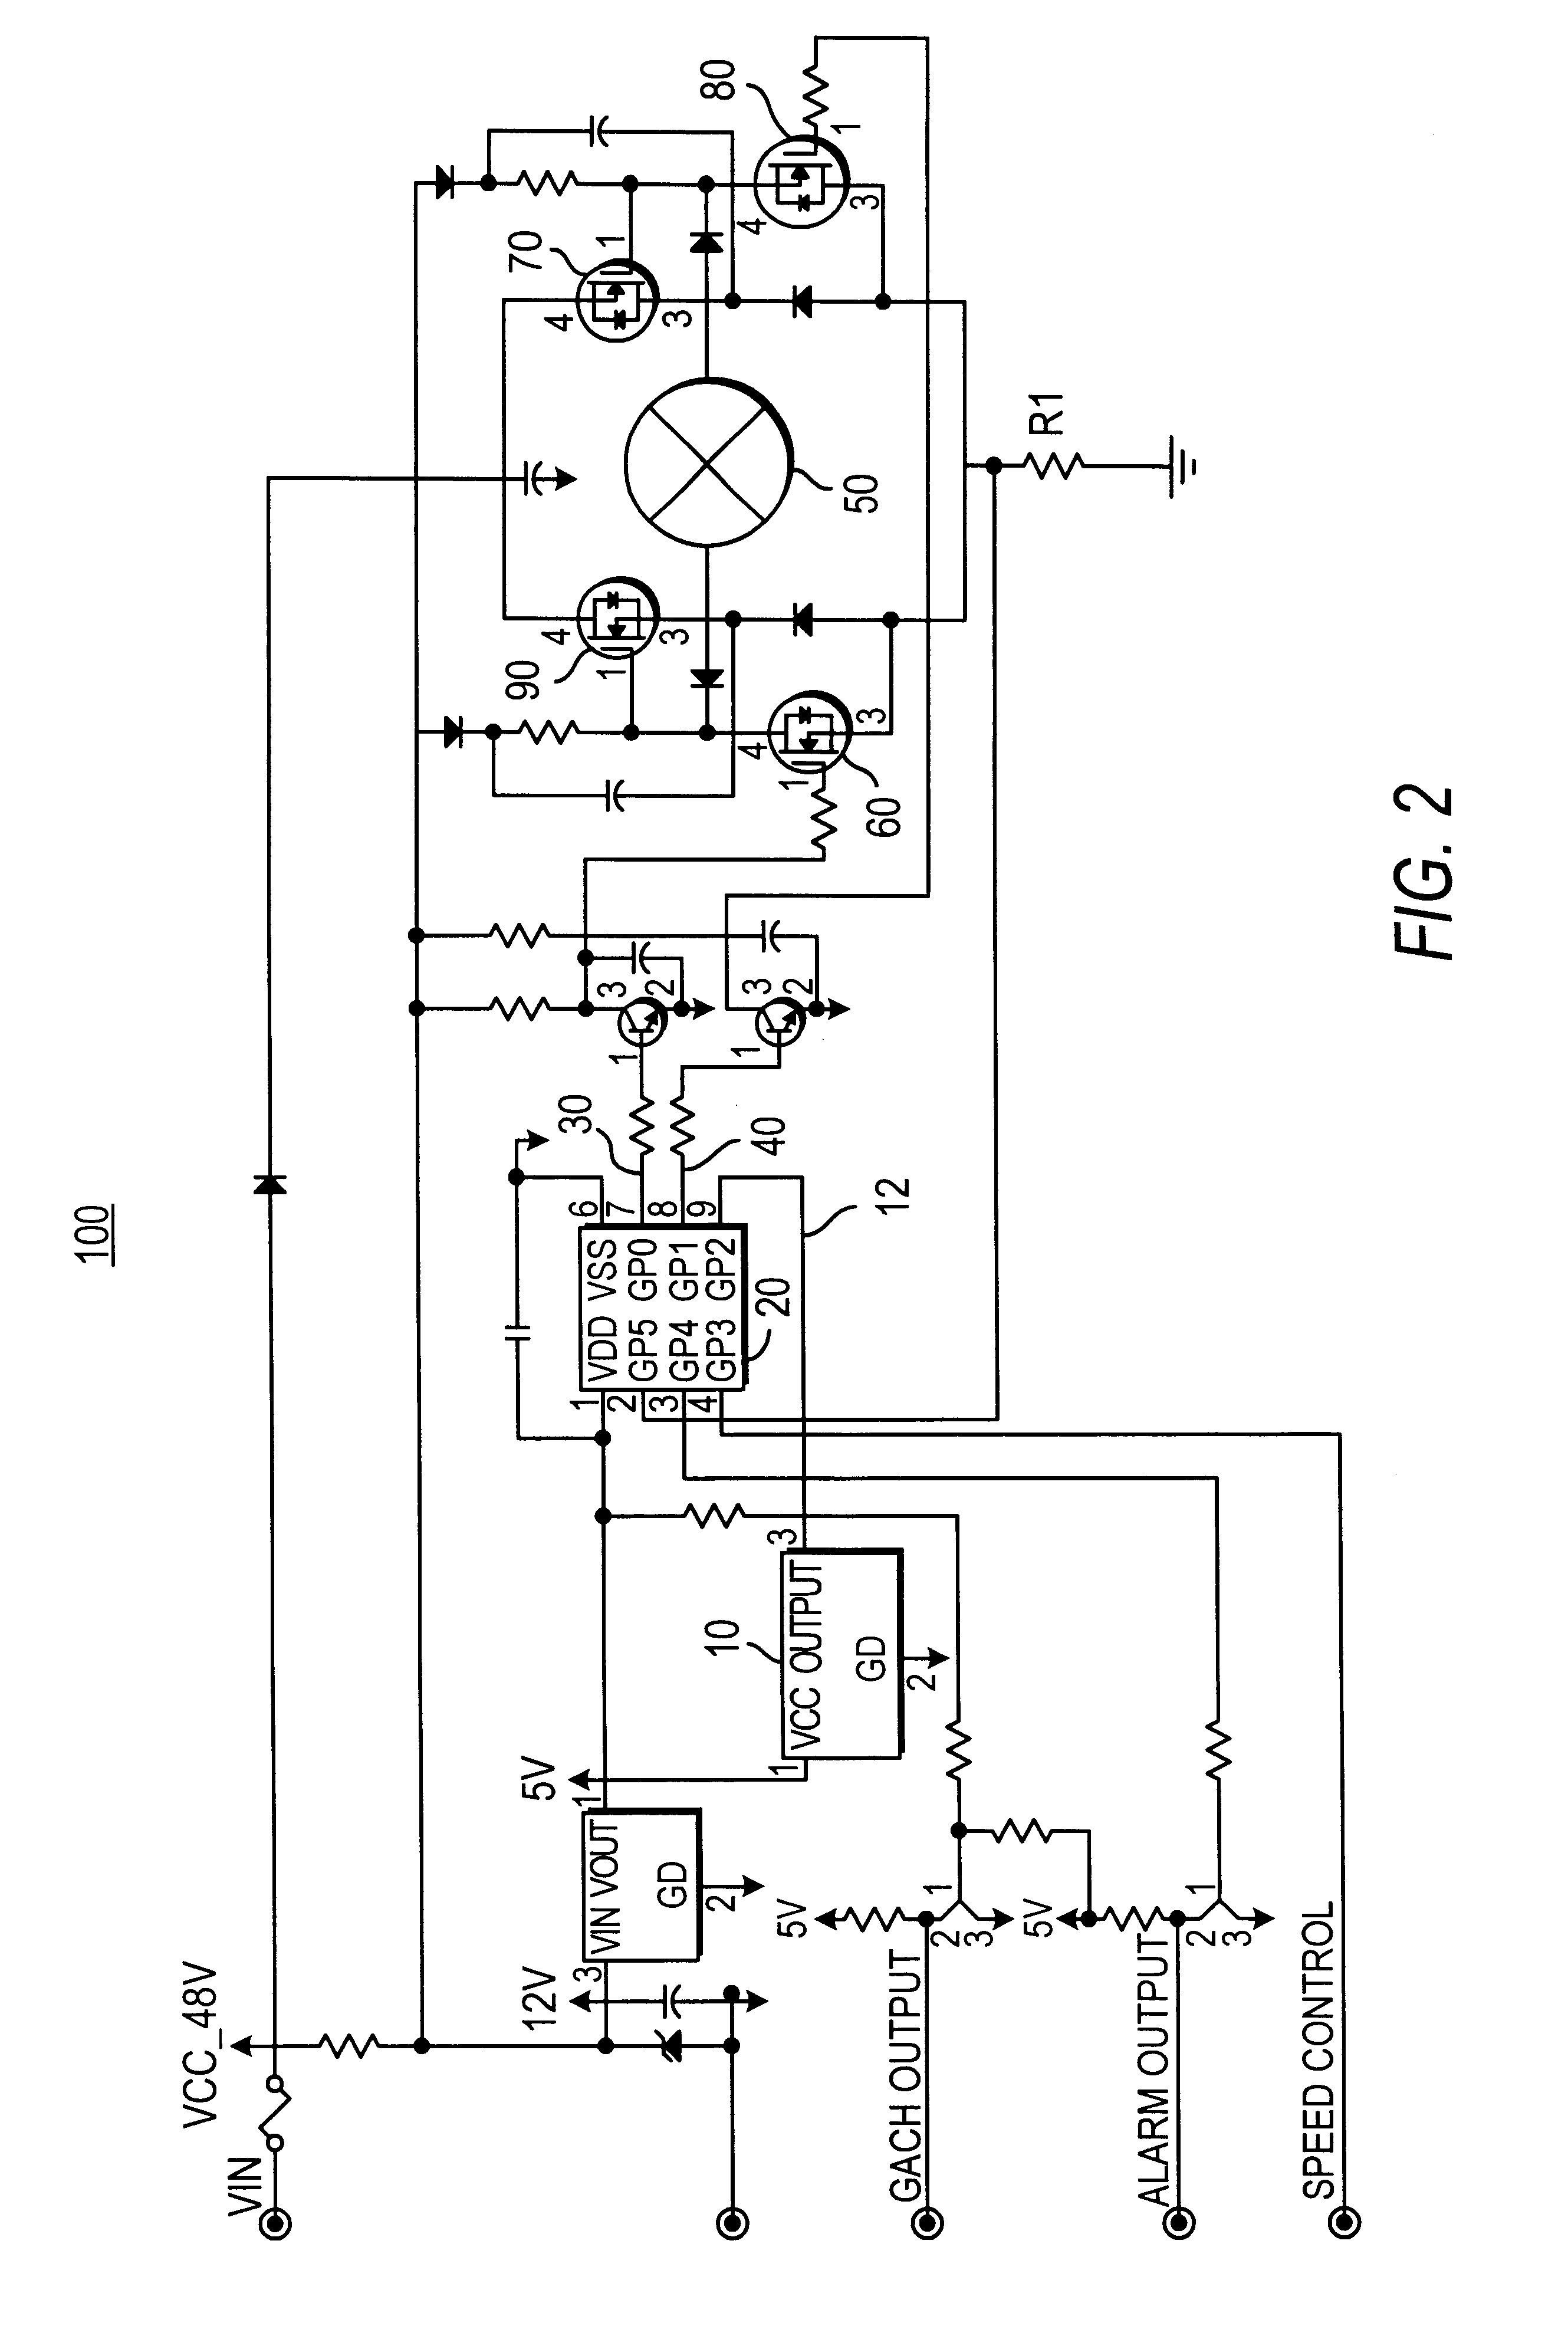 New Contactum Contactor Wiring Diagram Diagram Electrical Diagram Electrical Wiring Diagram